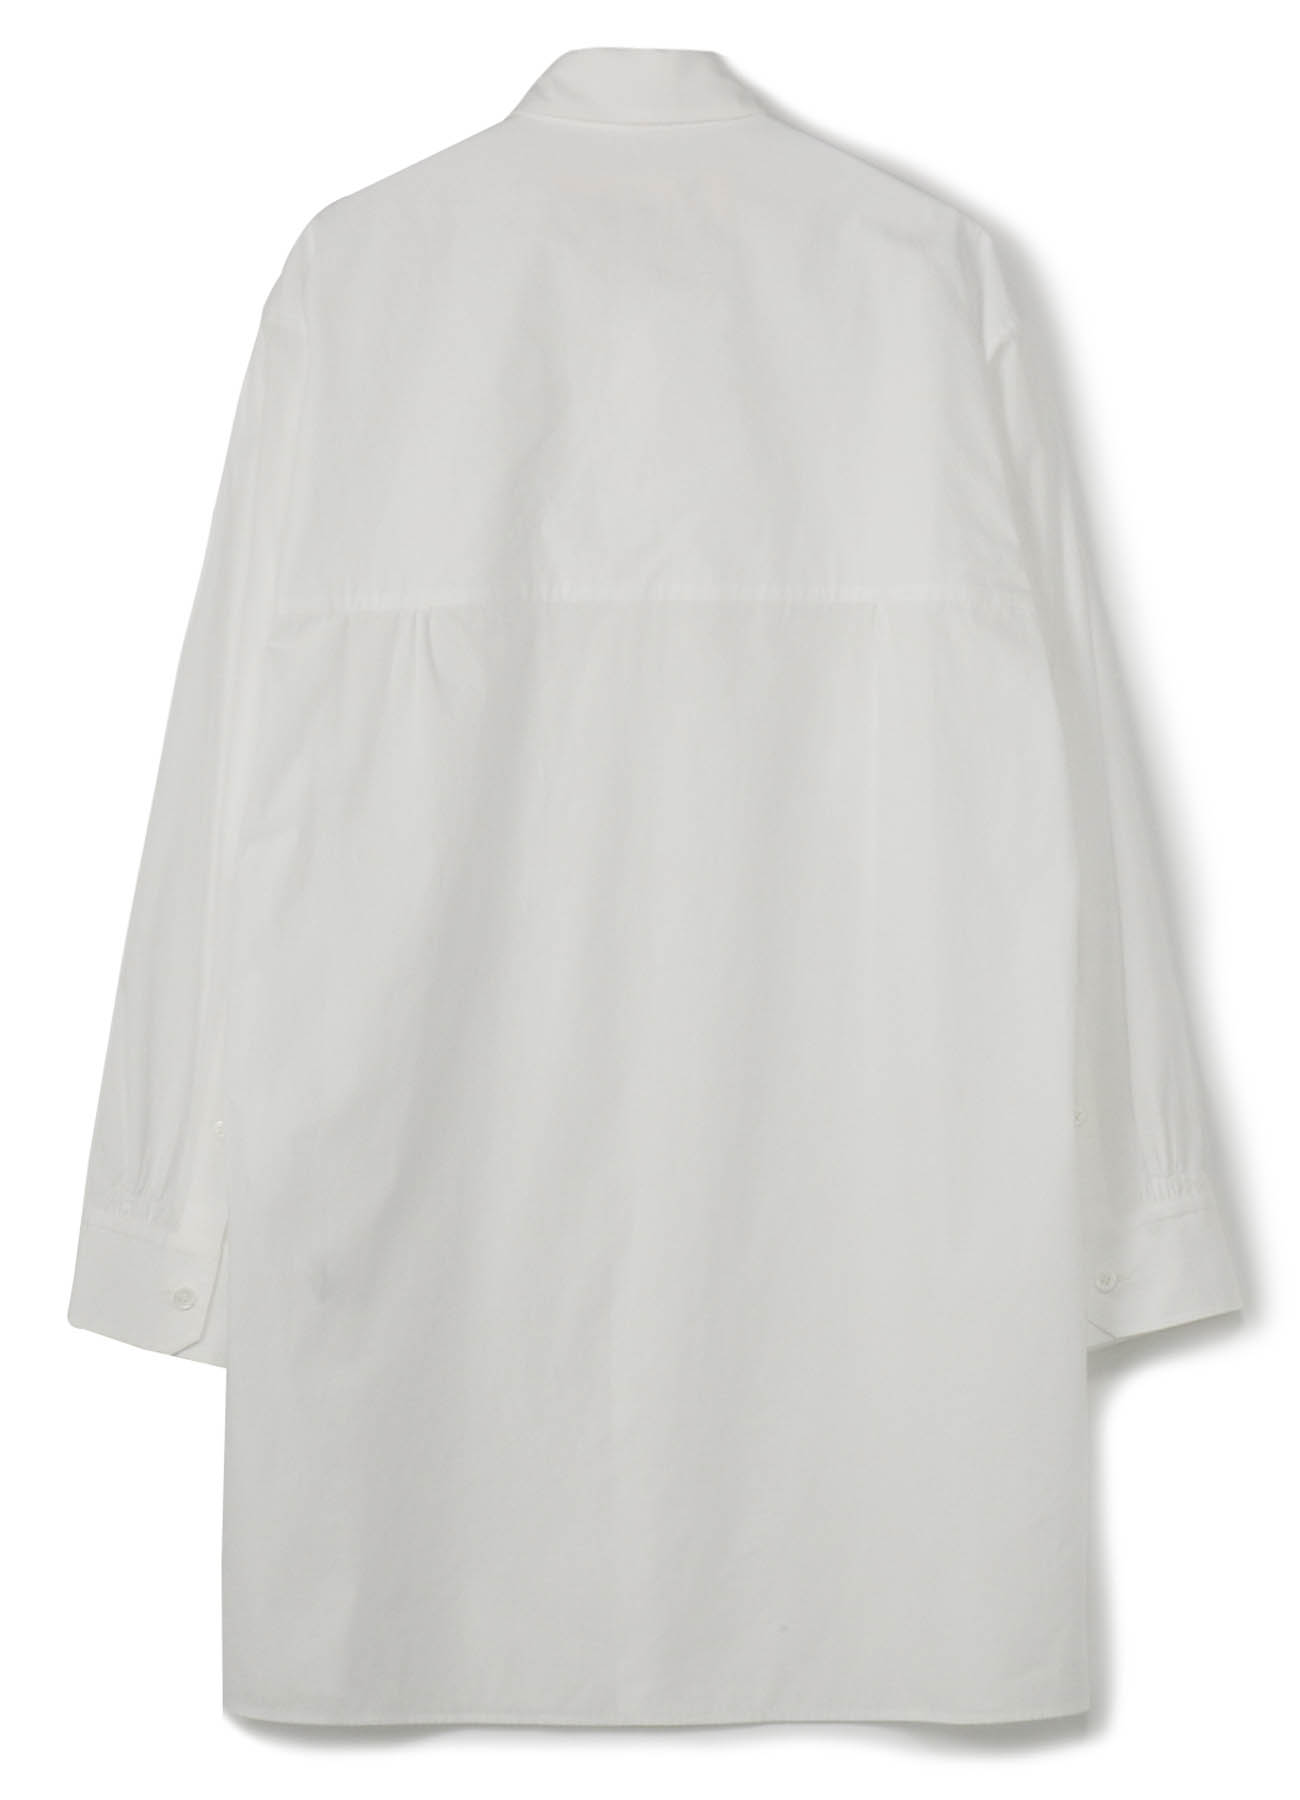 No.65 纯棉拼接口袋衬衫